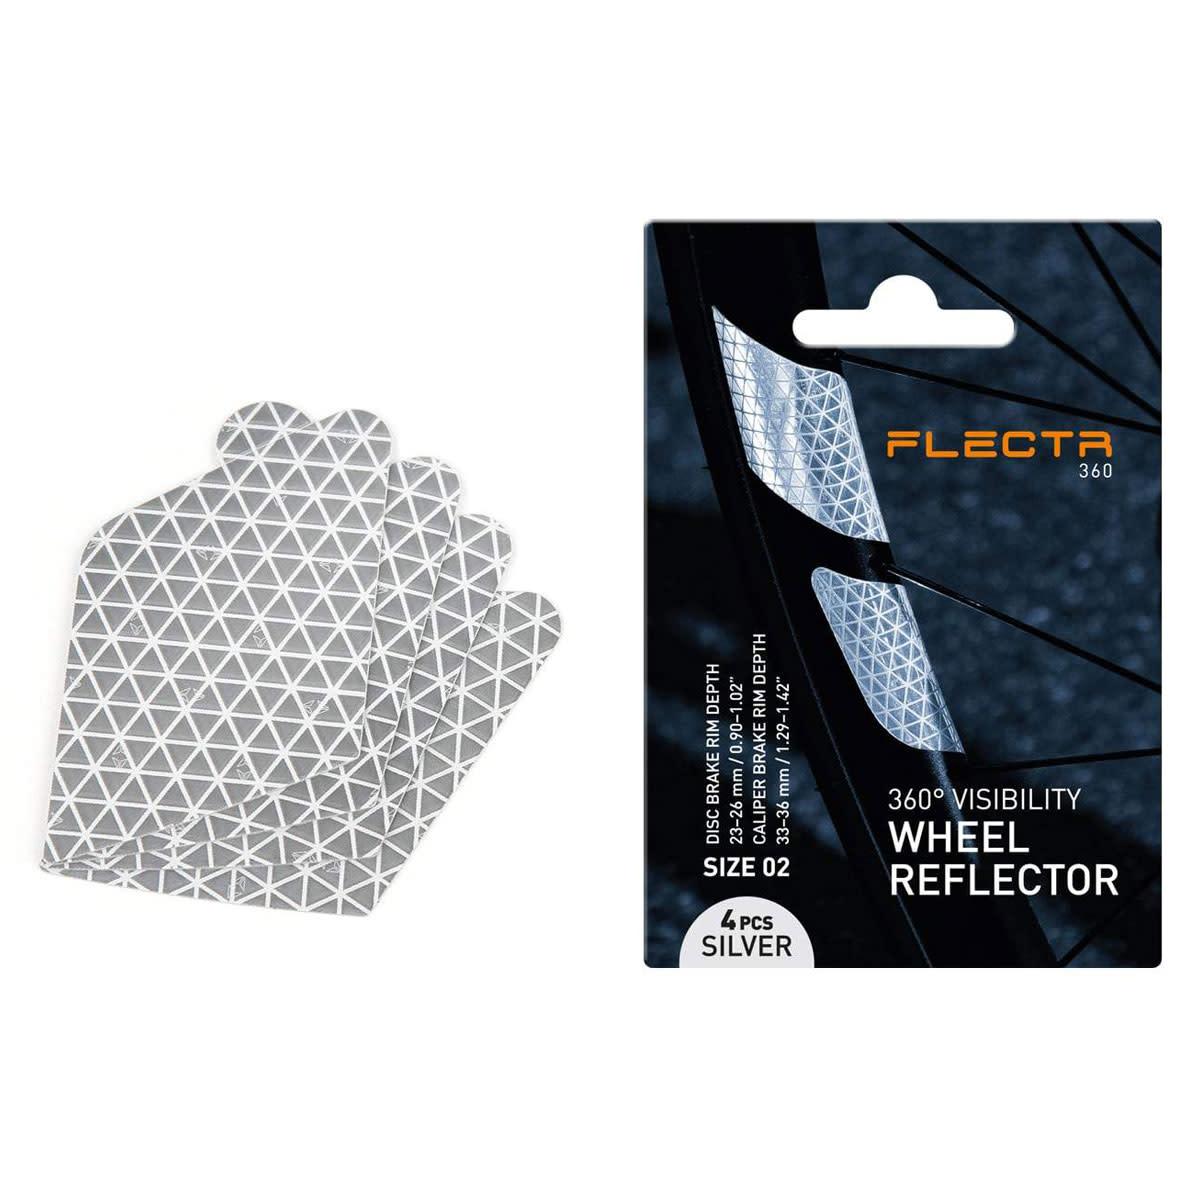 ENSEMBLE DE REFLECTEURS 360 FLECTR - 2